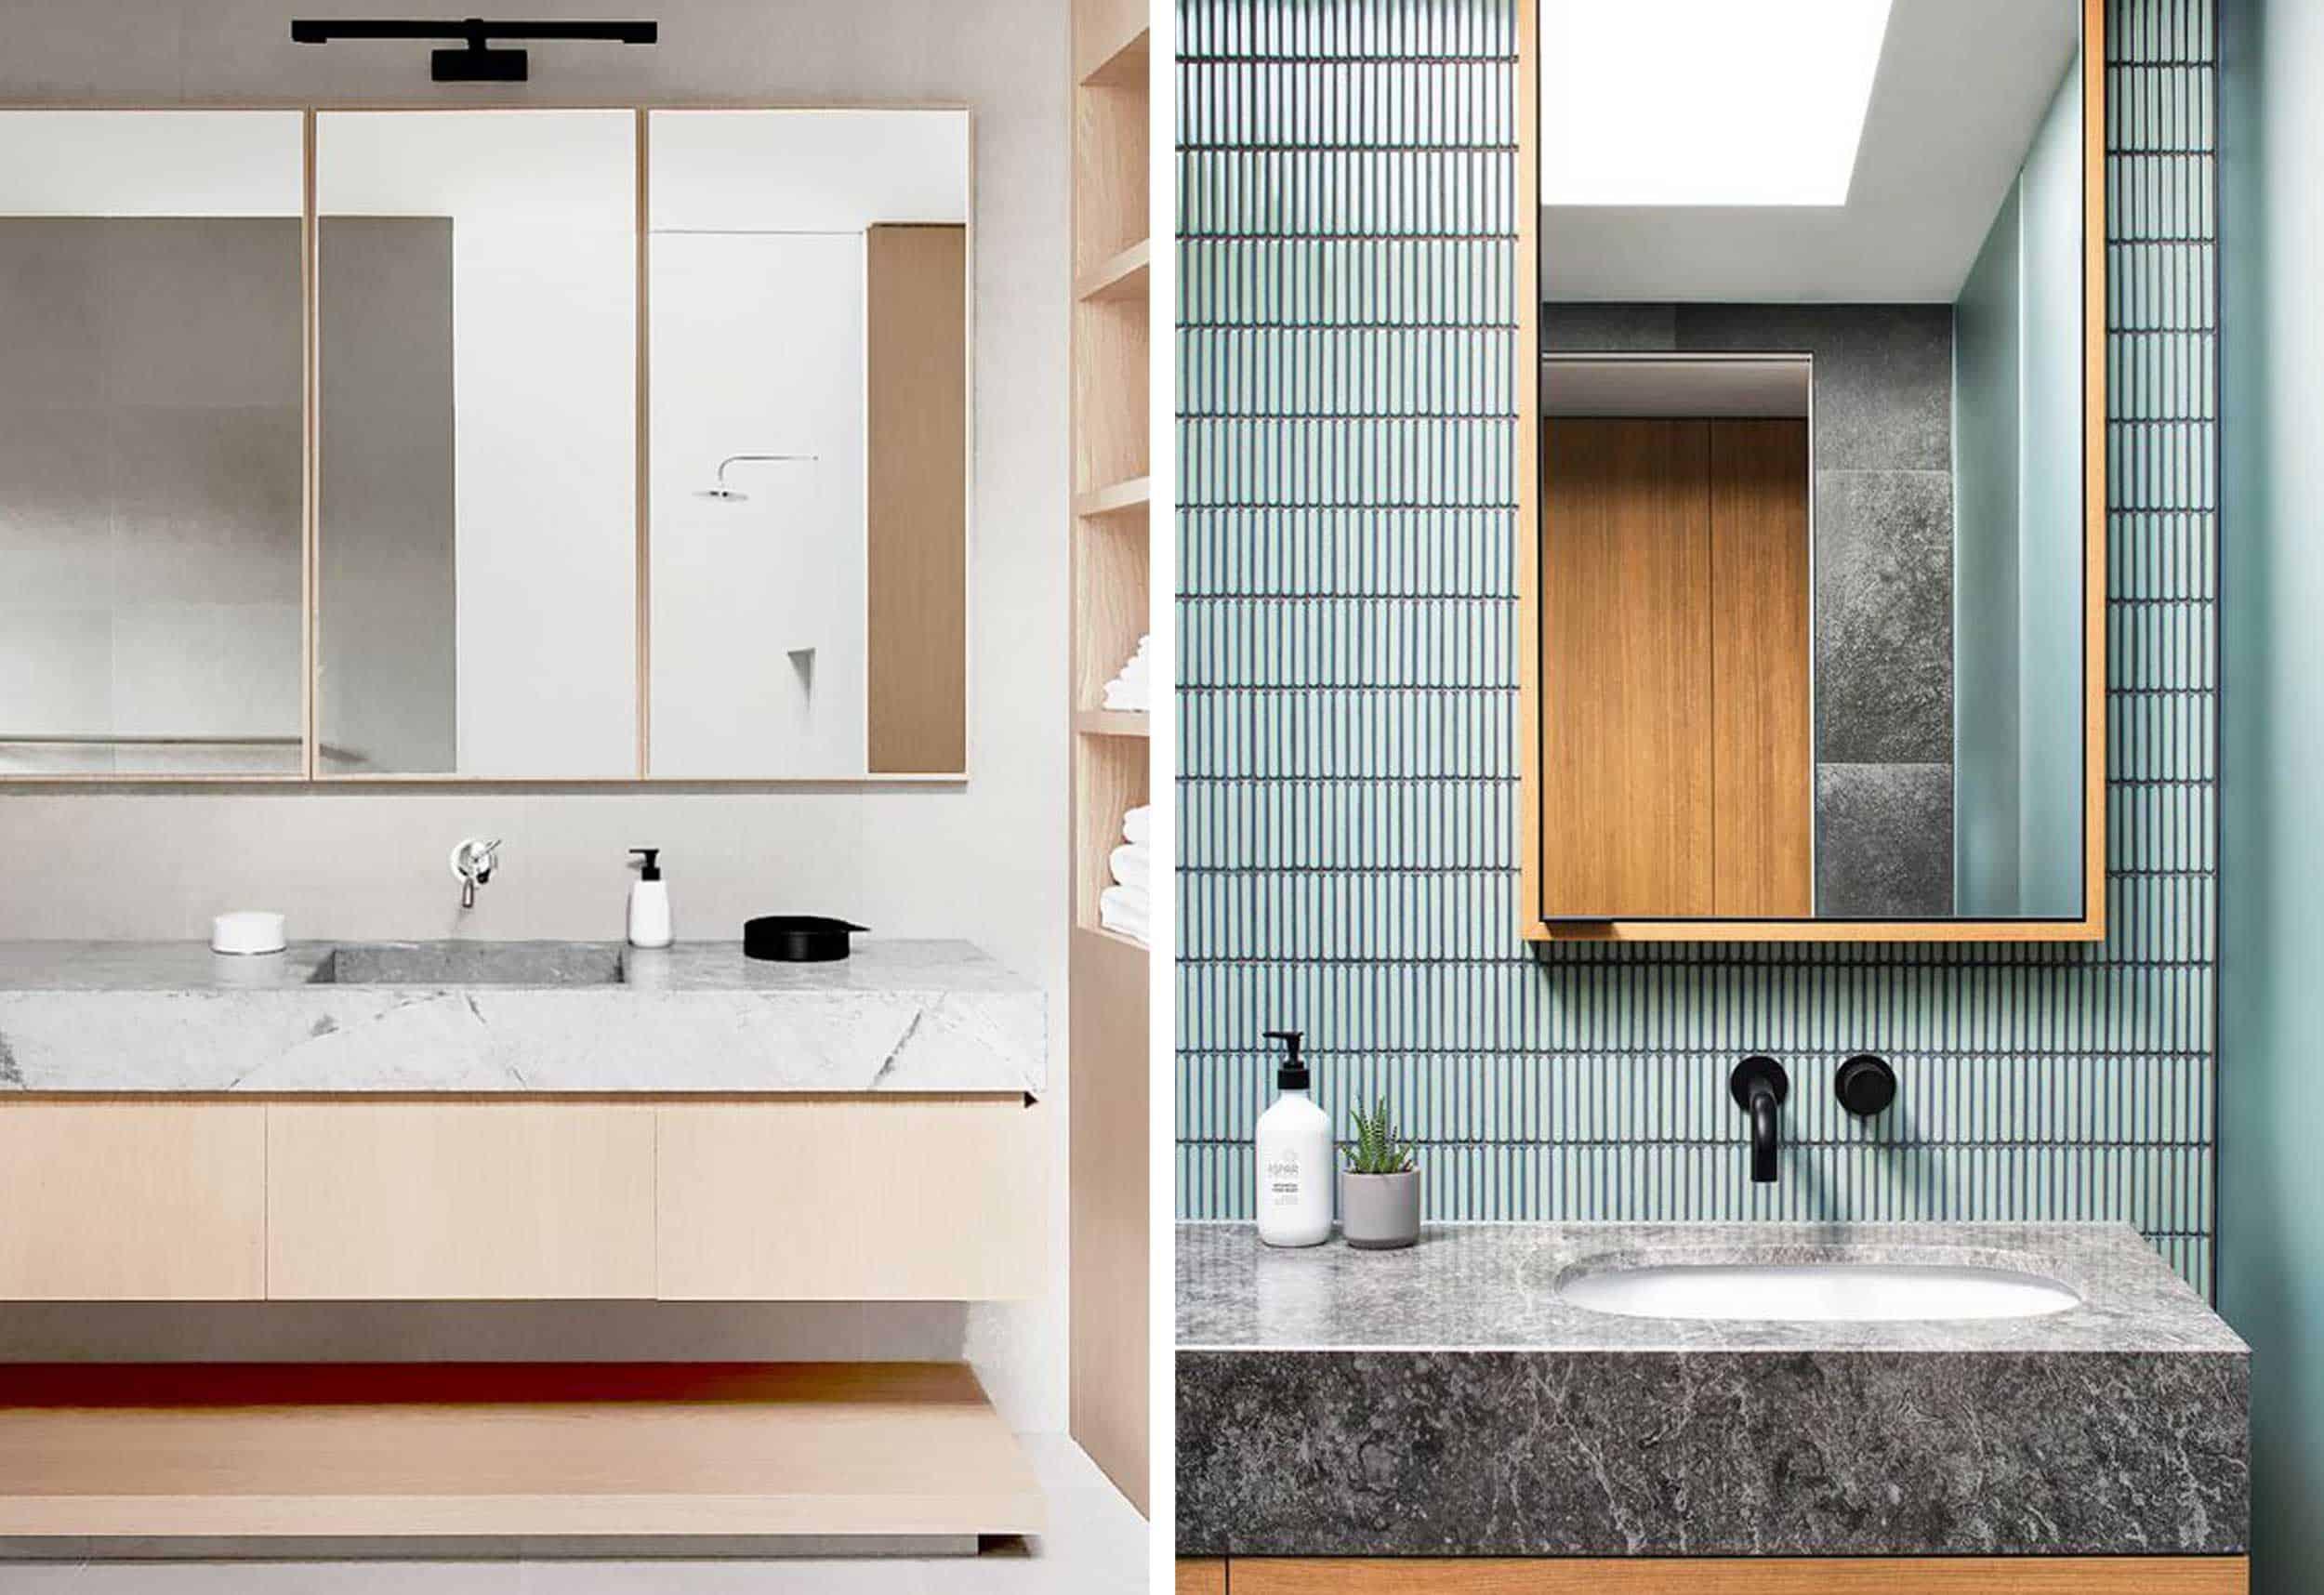 Designers Most Medicine Cabinets